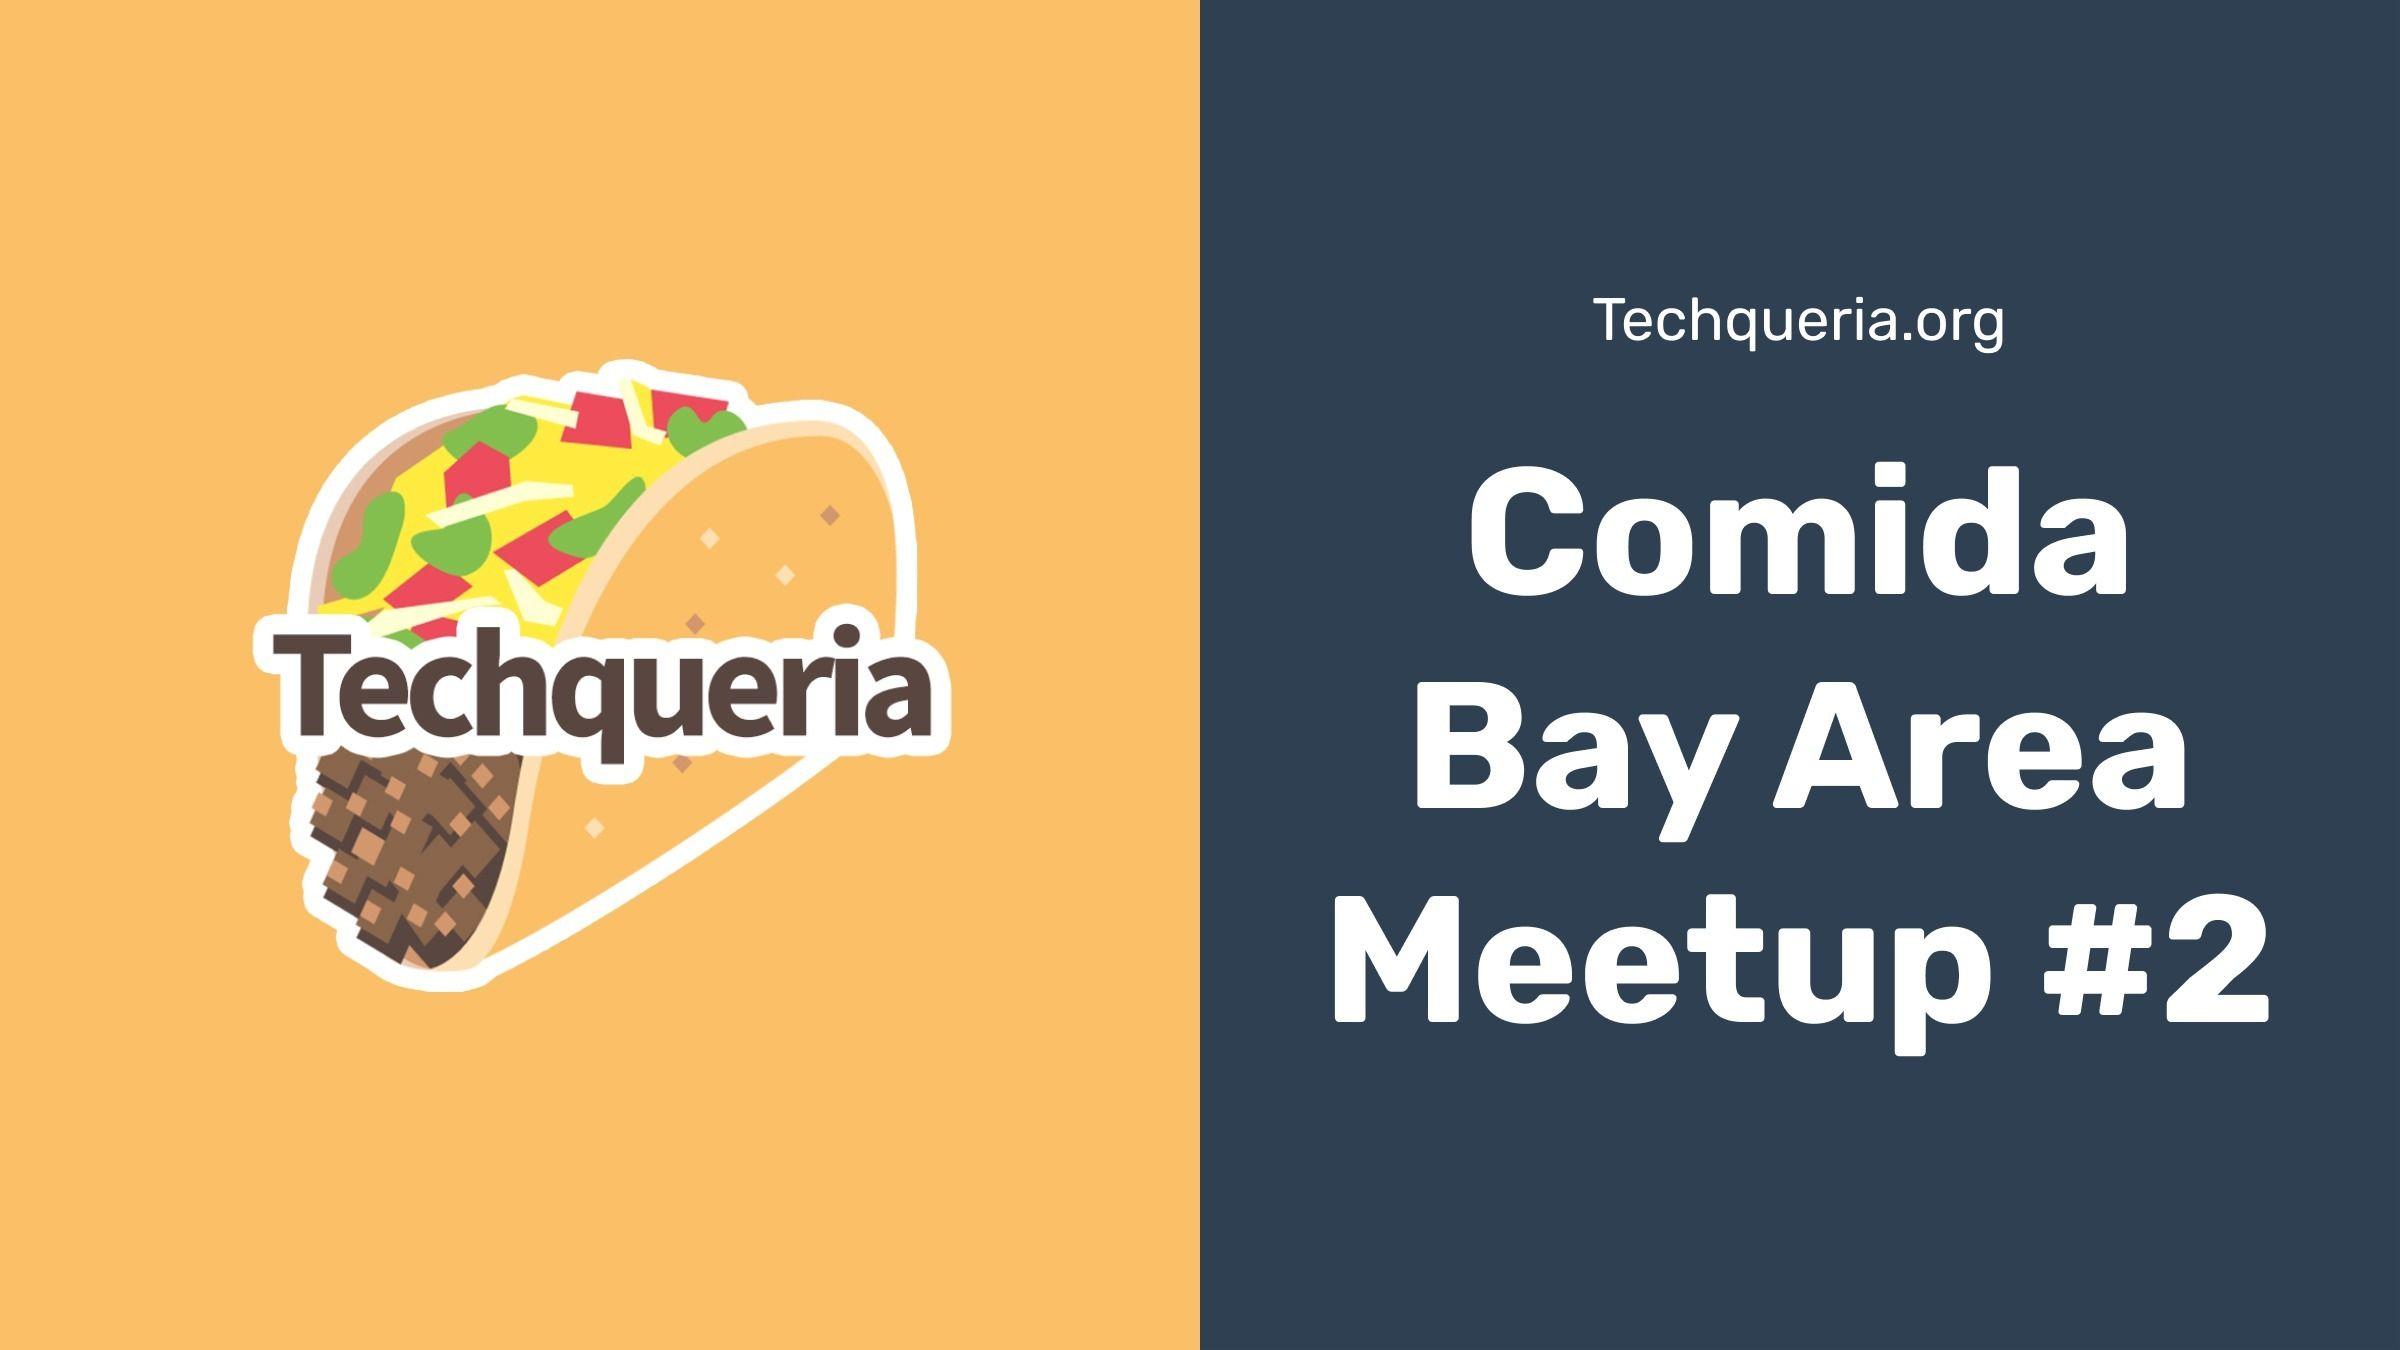 Comida Bay Area Meetup #2